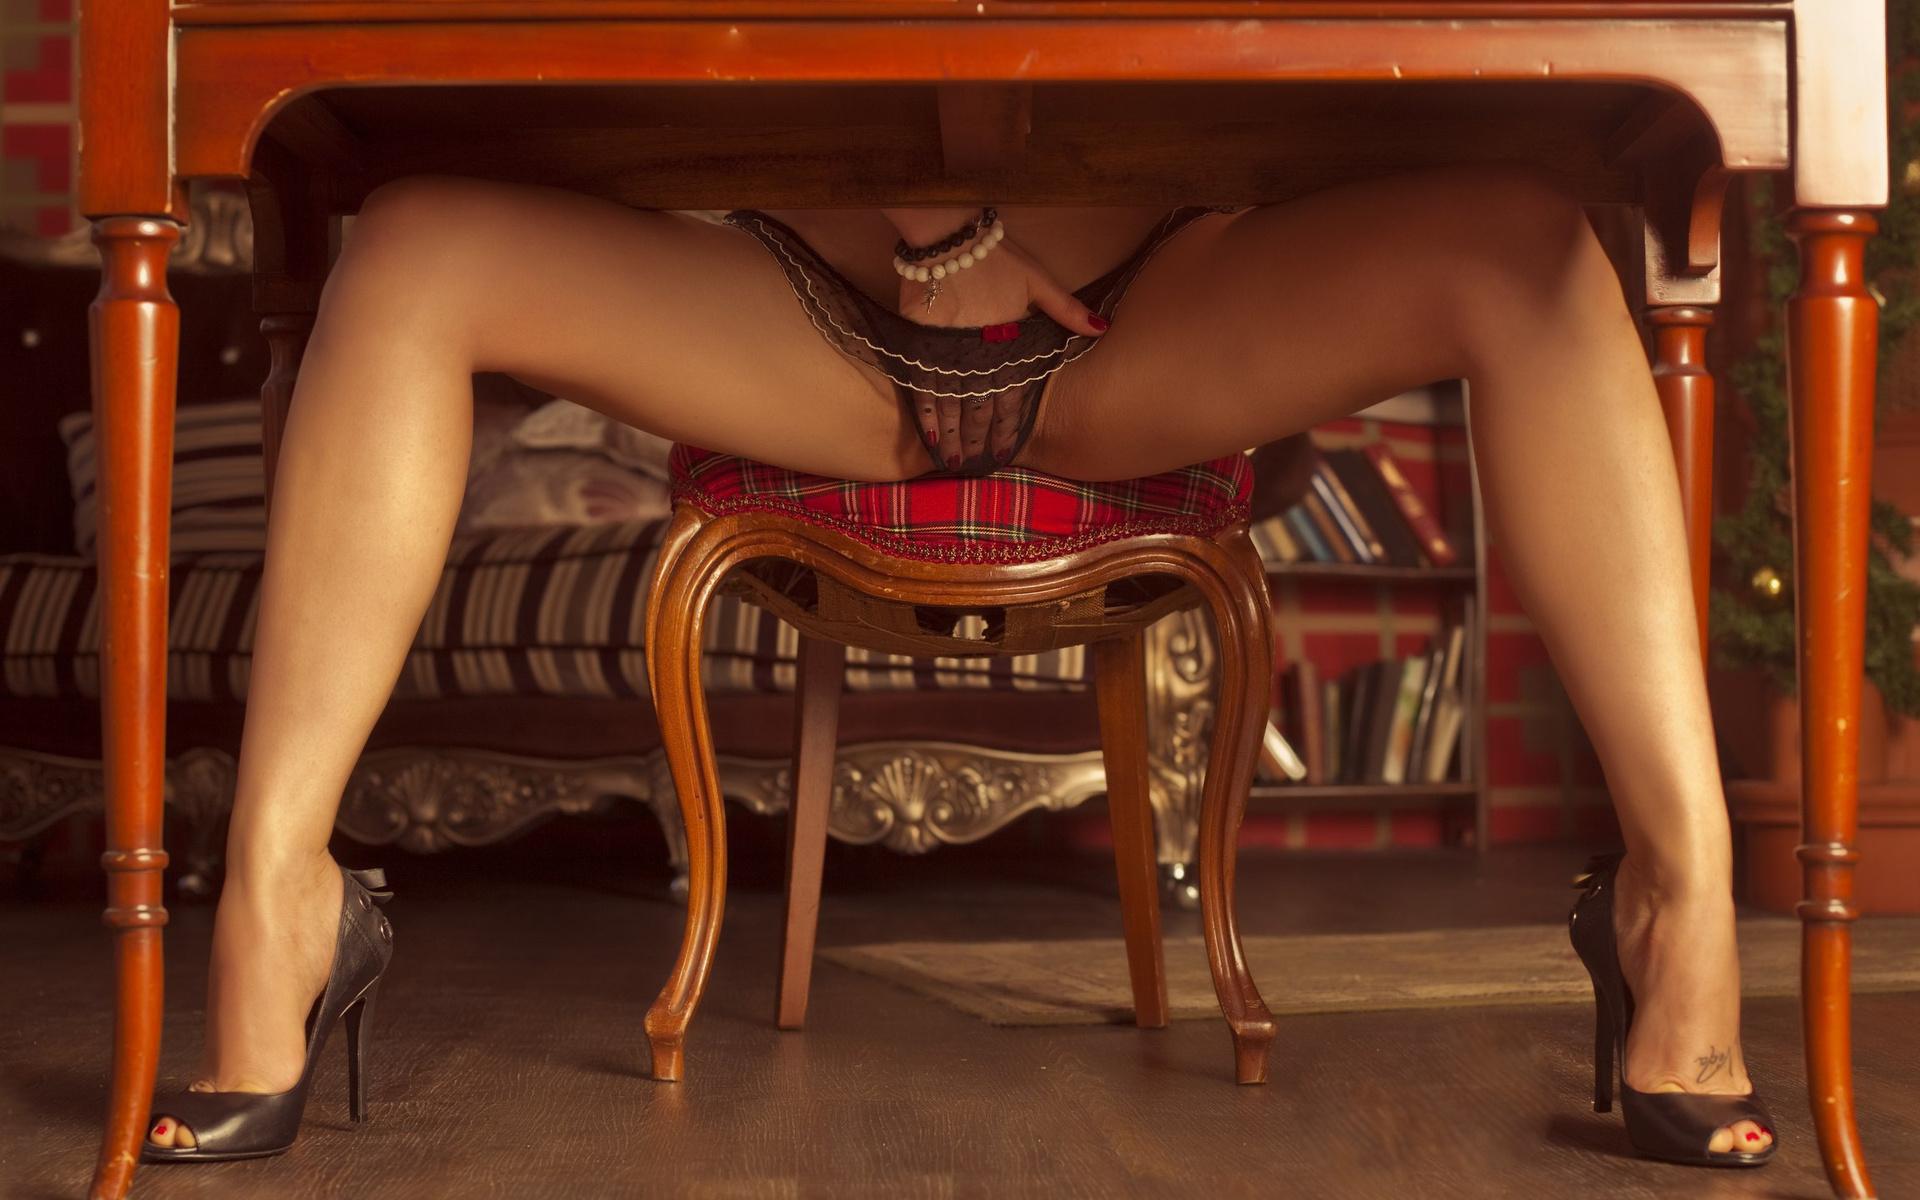 отношениям секс девушки раздвигают ножки под столом например, очень рада